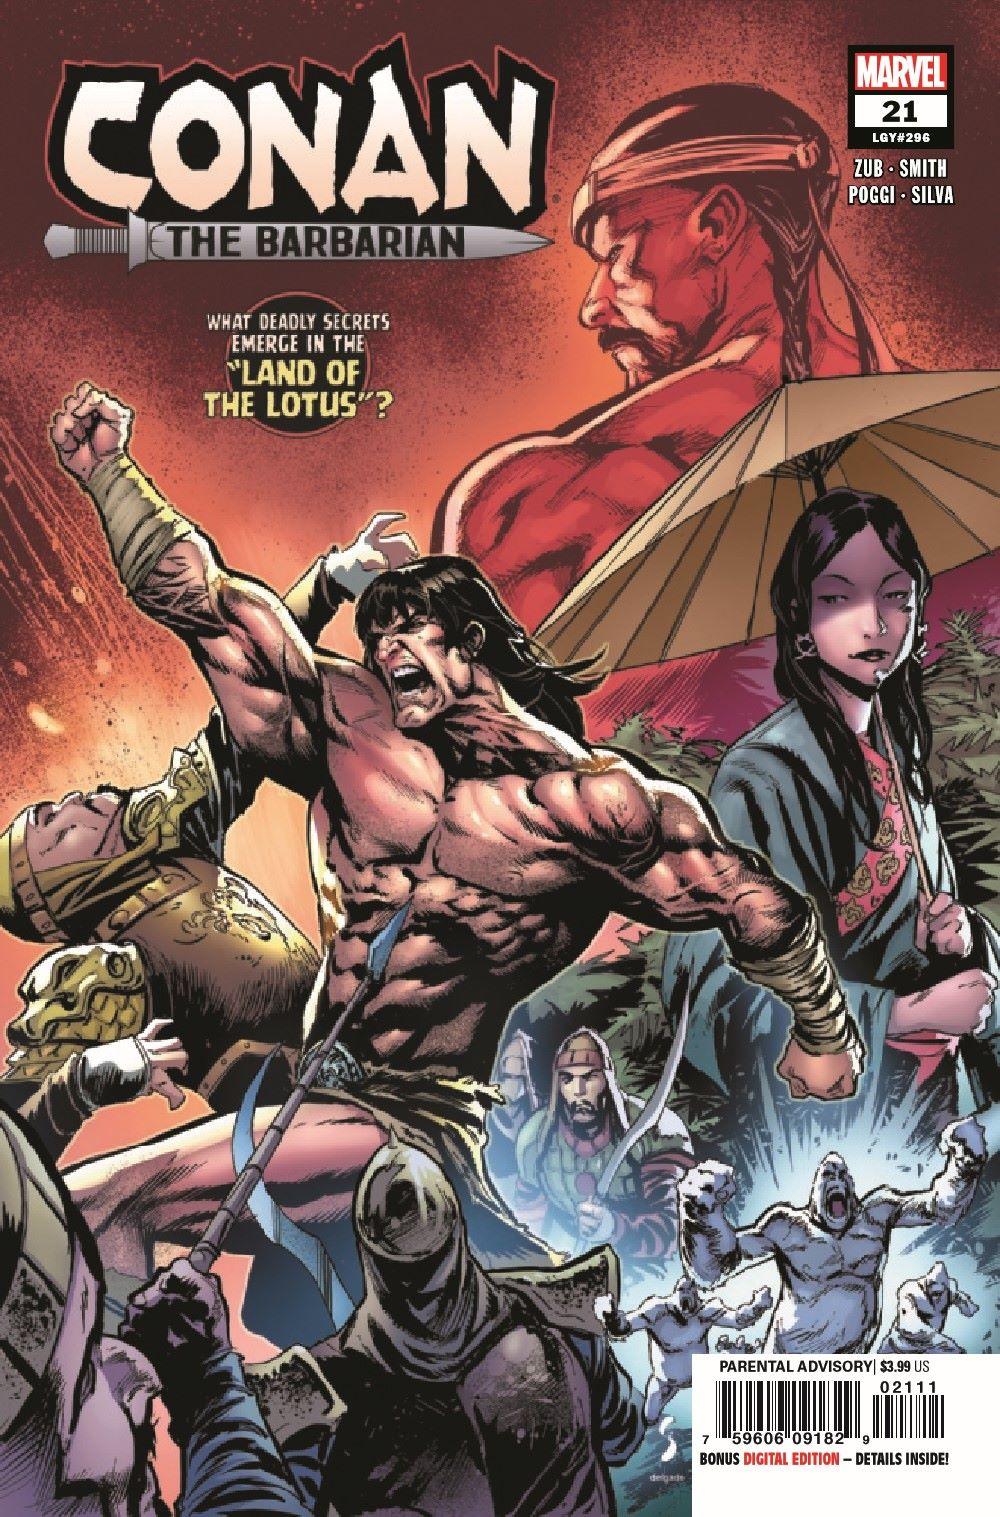 CONANBARB2019021_Preview-1 ComicList Previews: CONAN THE BARBARIAN #21